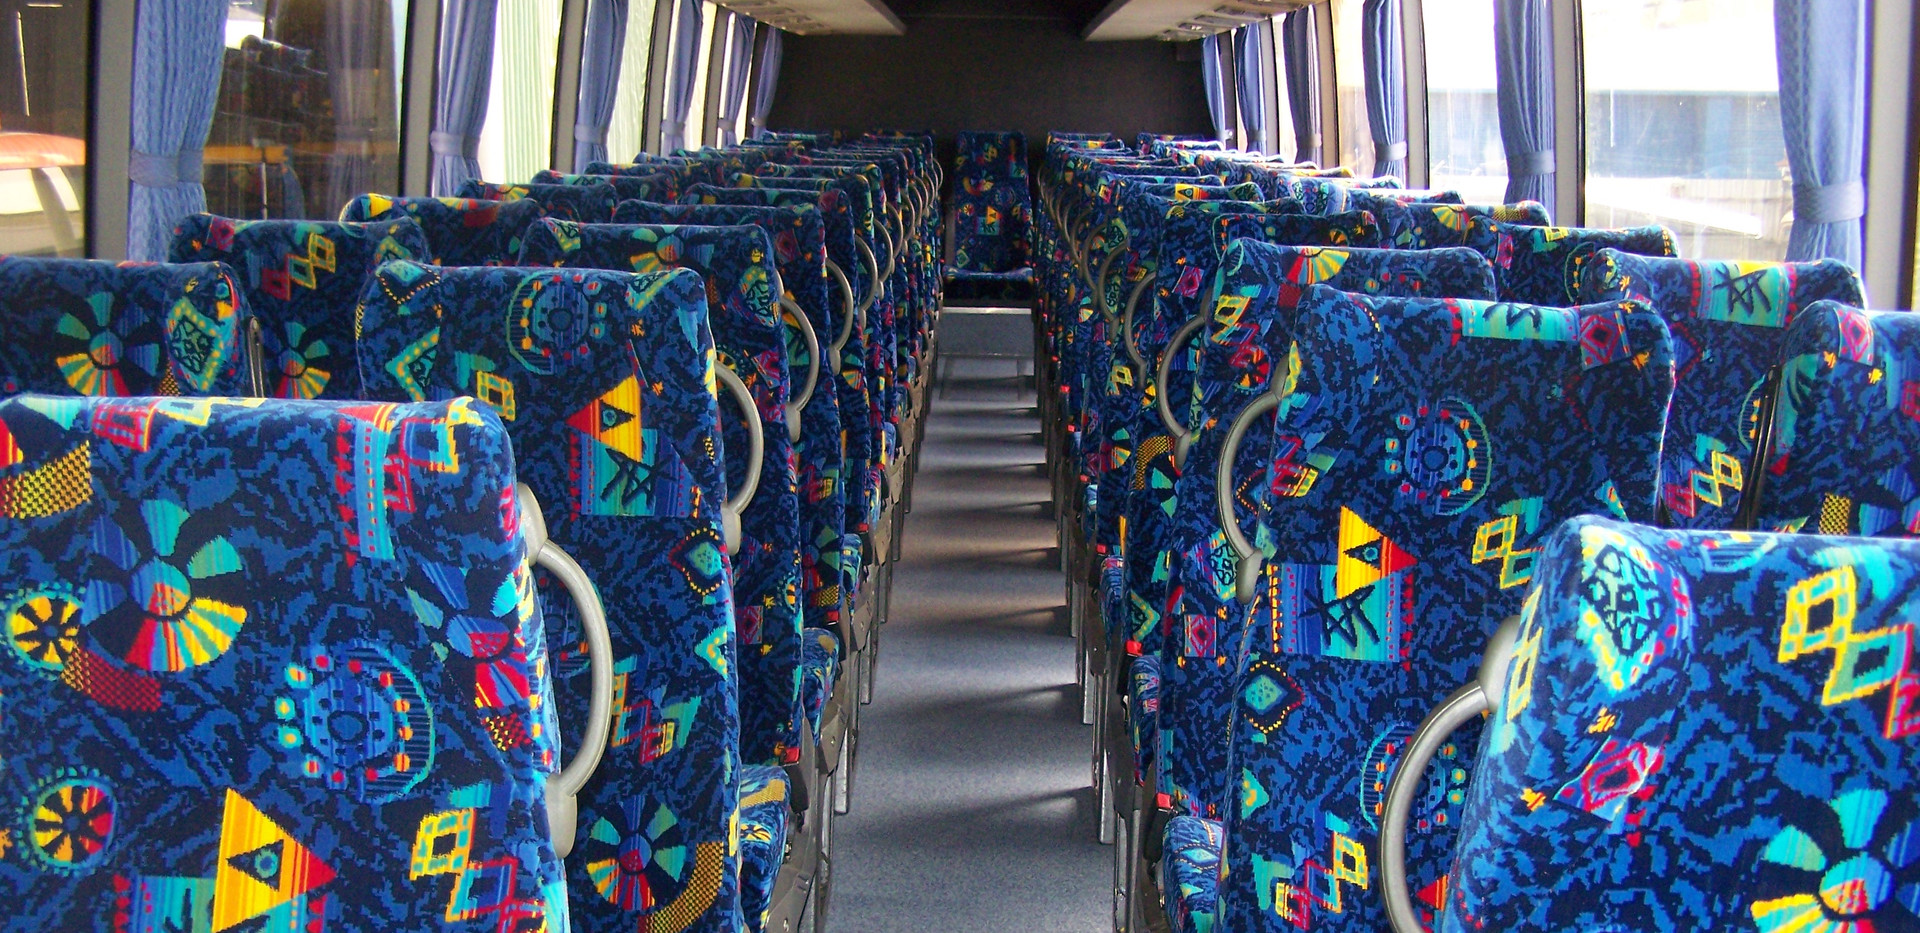 Autobus Floor and Seat09.JPG